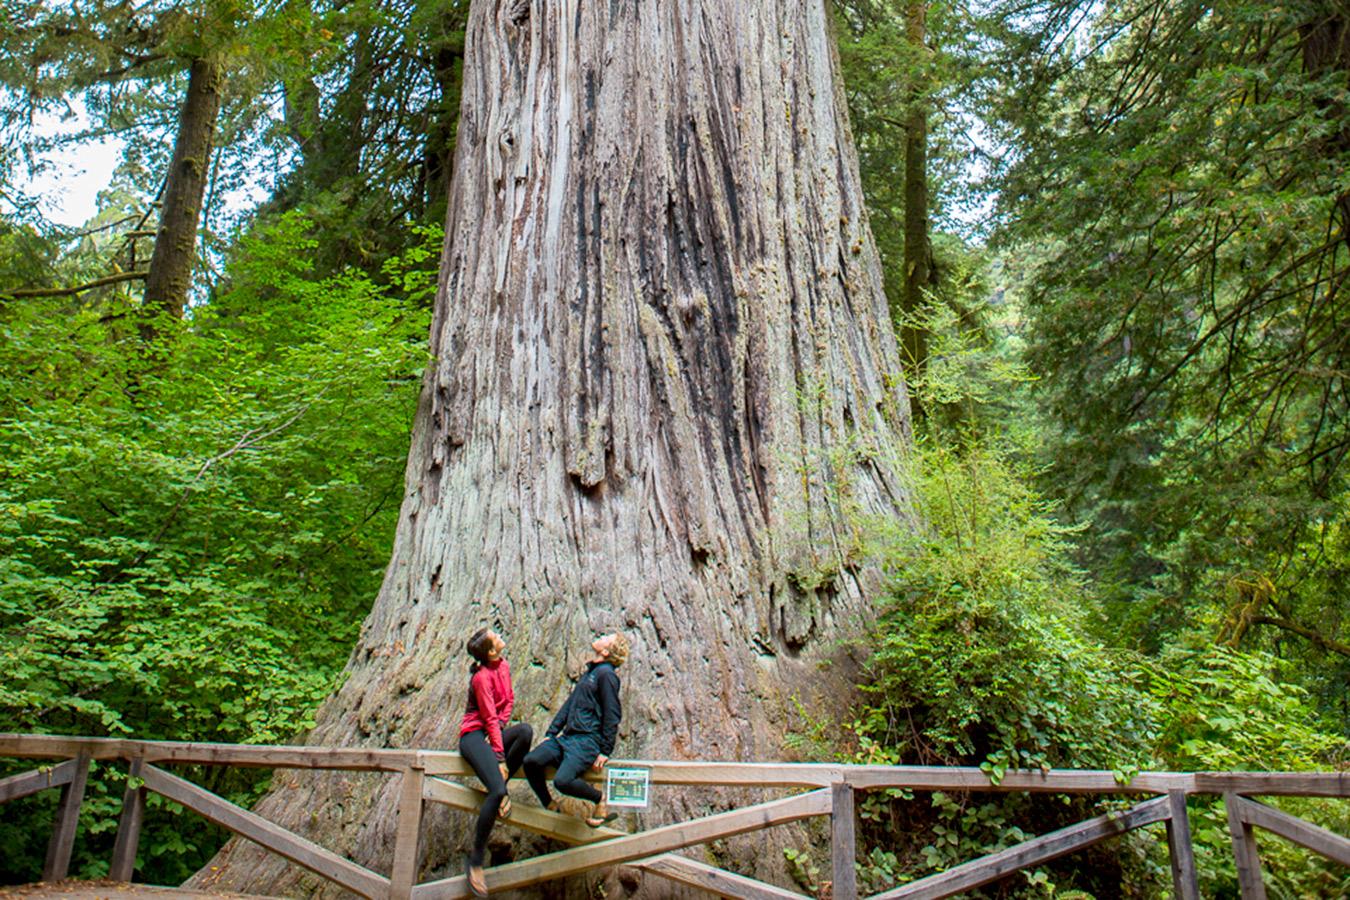 banner image is of Humboldt Destination Founder's Grove